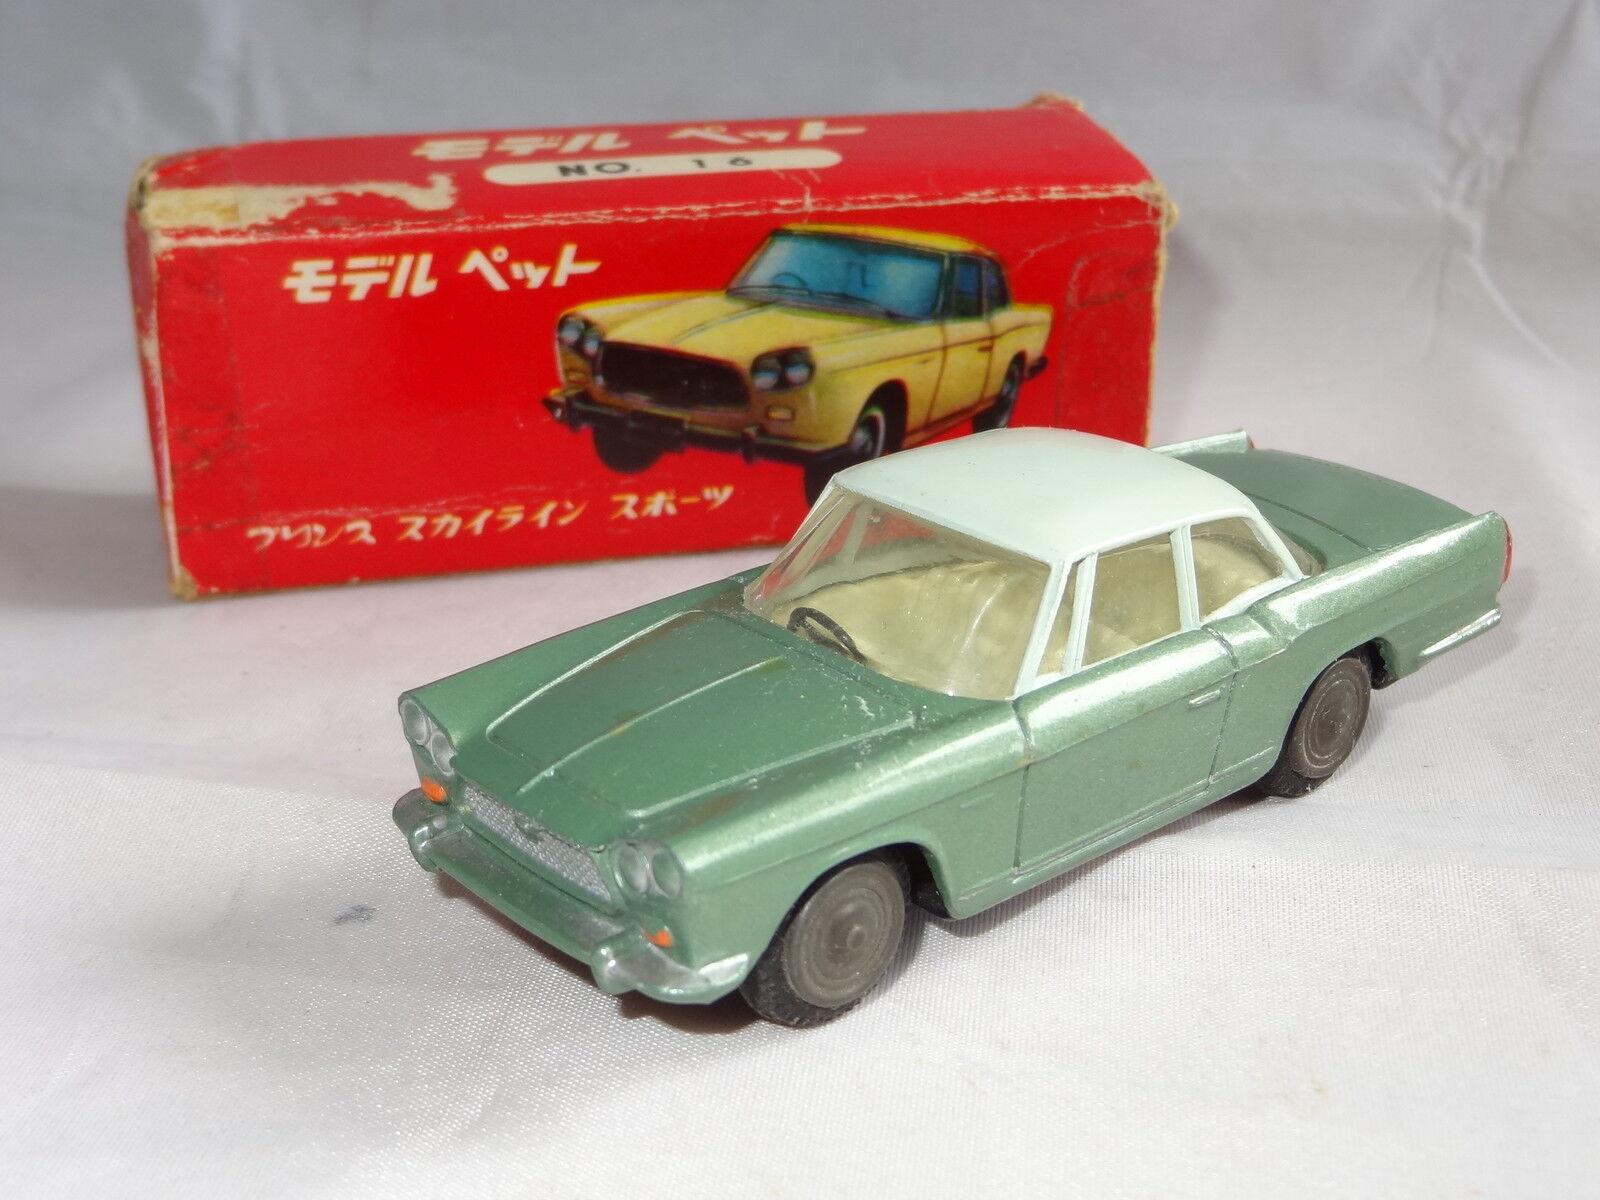 Asahi Toy ATC Model Pet Japan - PRINCE SKYLINE SPORTS  - 16